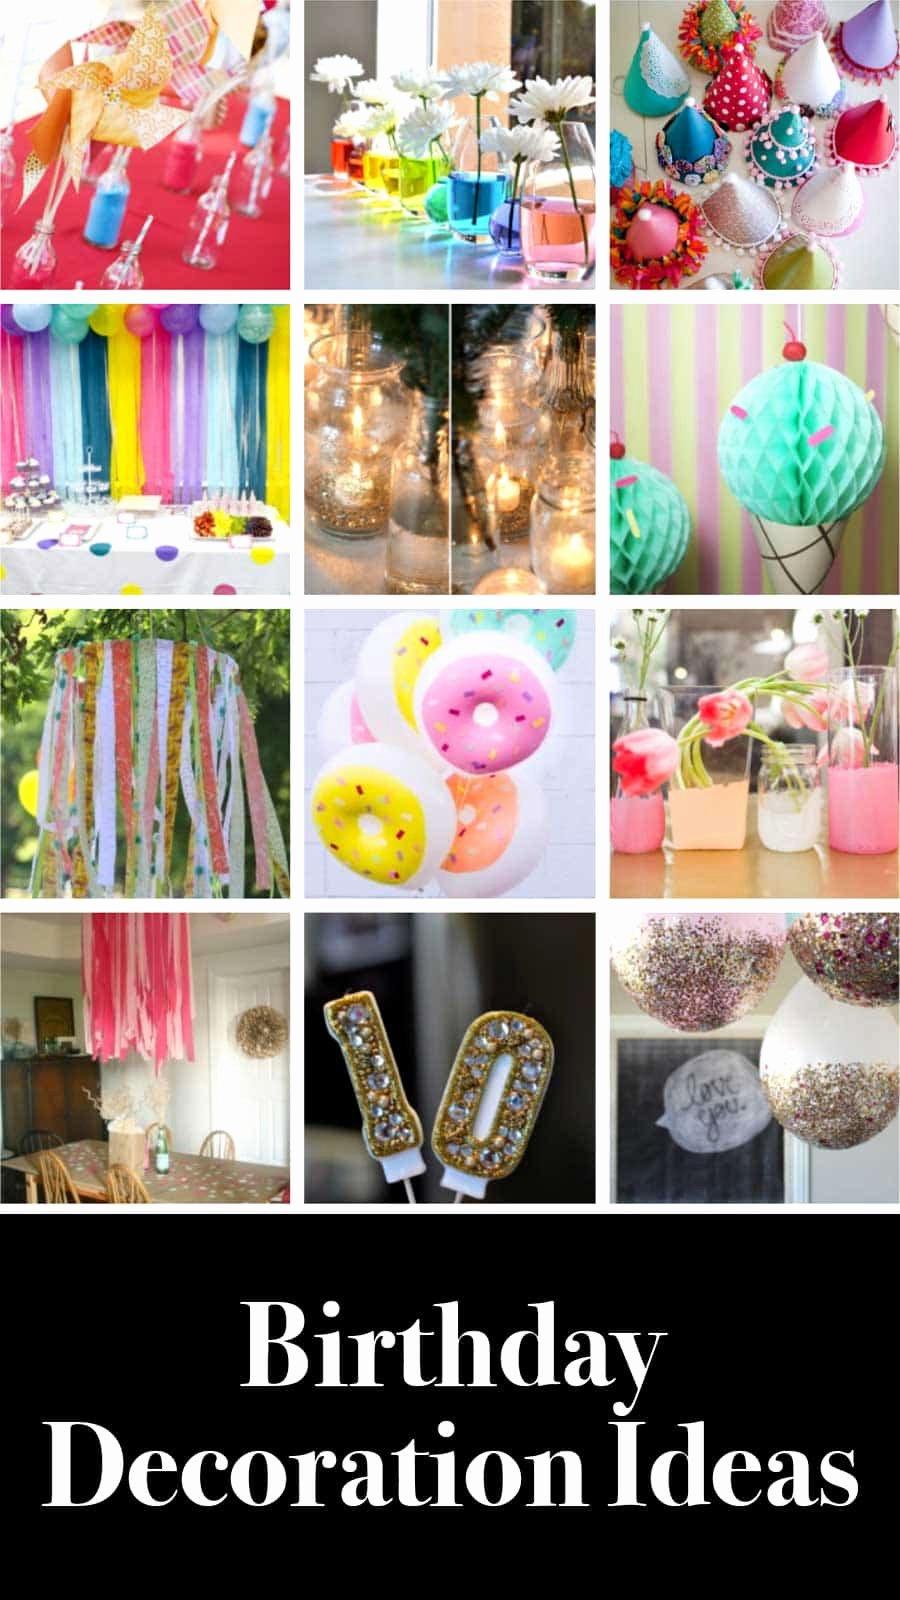 Happy Birthday Decoration Ideas at Home Unique 12 Easy Diy Birthday Decoration Ideas 2020